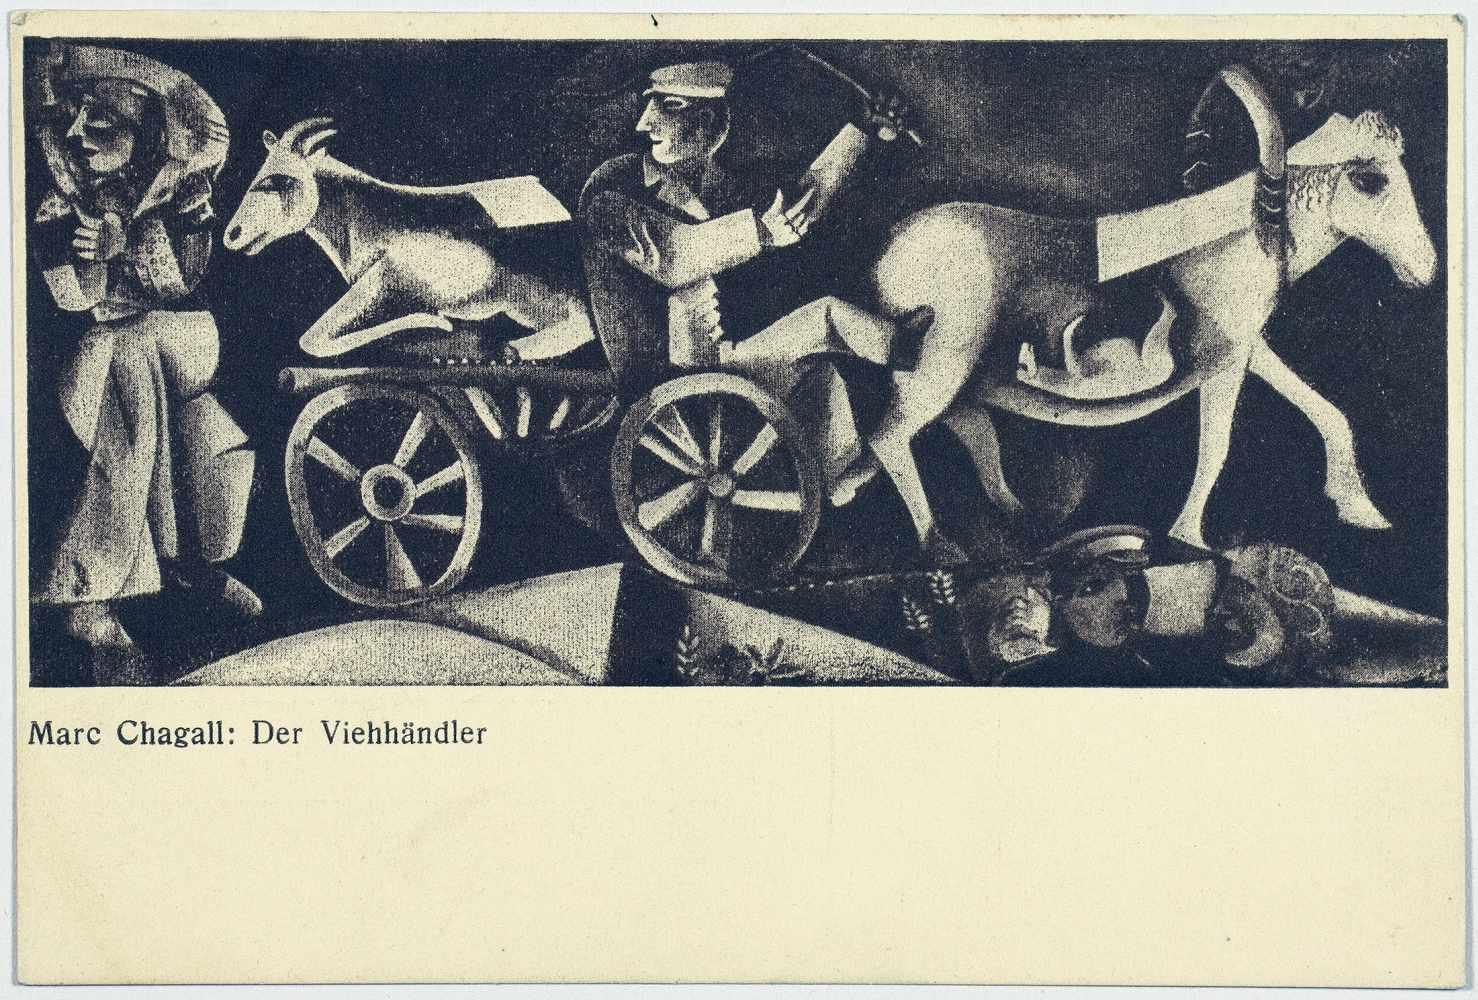 Sturm-Postkarten. Vier Postkarten. Um 1915. Ca. 14 : 10 cm. I. Marc Chagall. Kleinstadt. - Image 2 of 4